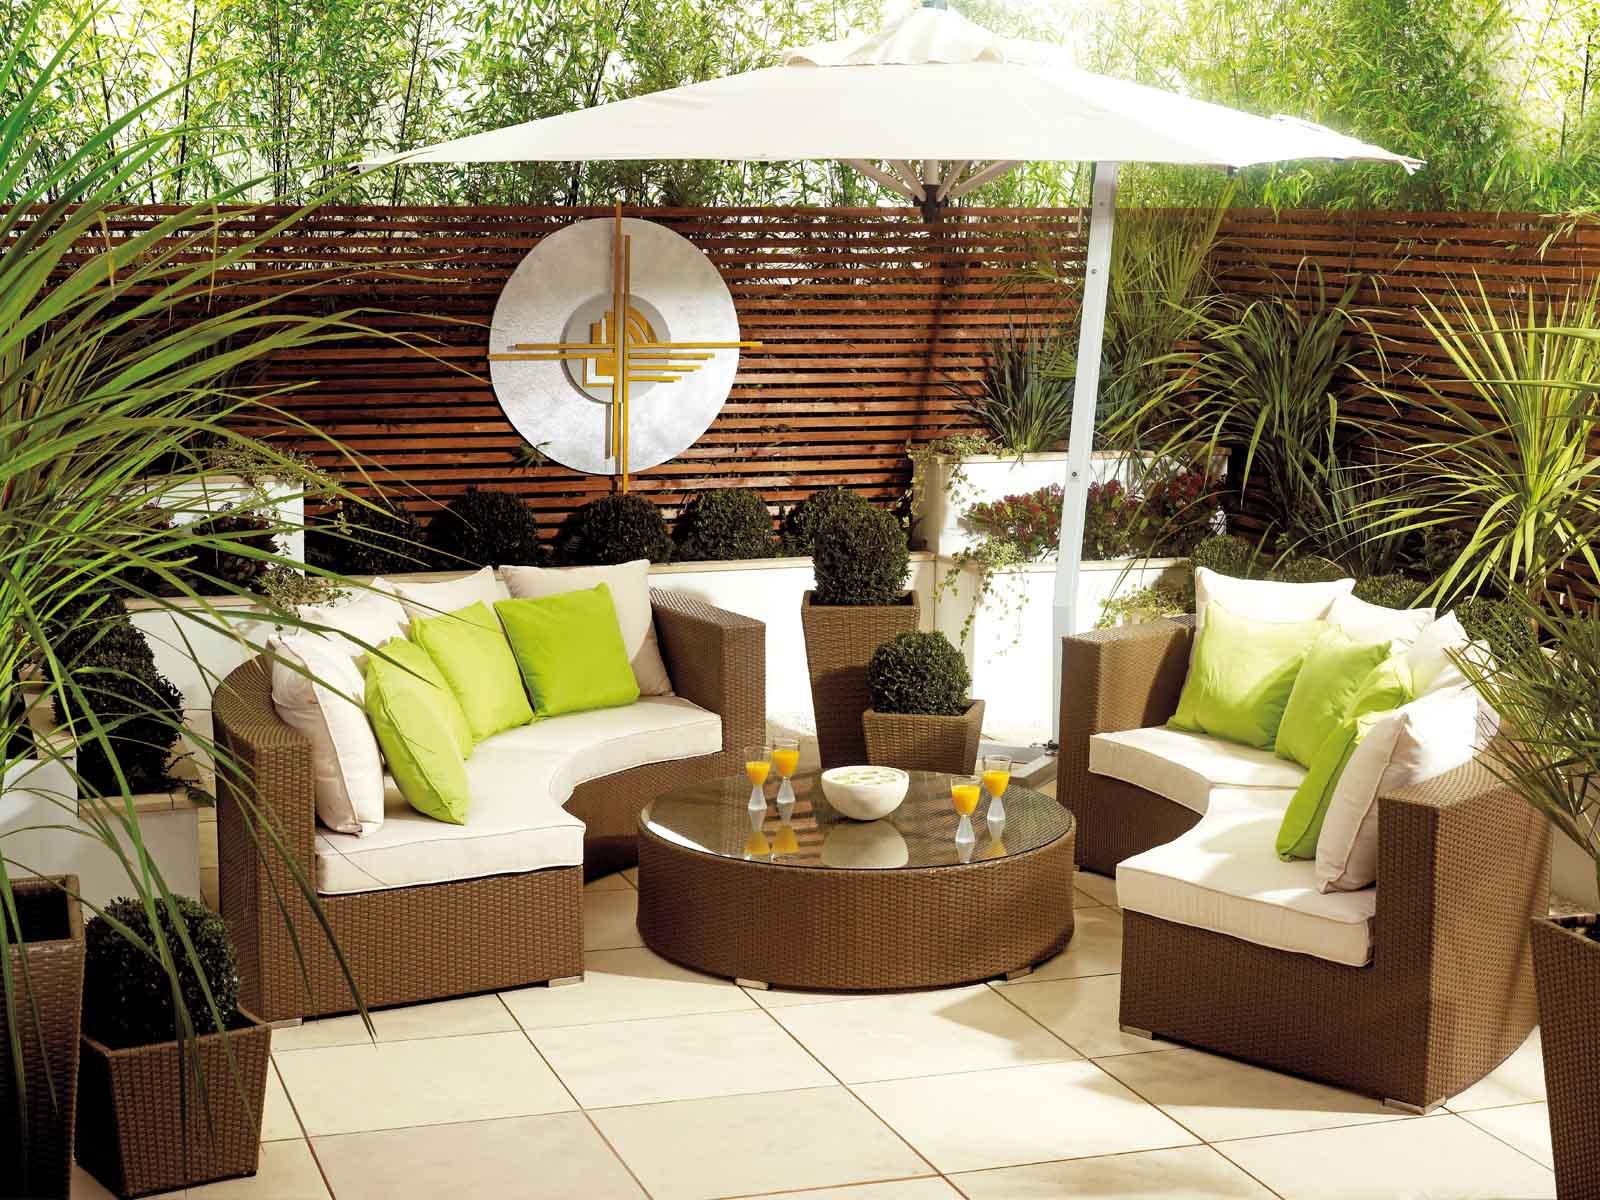 Outdoor Furniture Ahmedabad | Outdoor Swing, Outdoor Coffee Set, Dining Set  | Pergola, Cabana